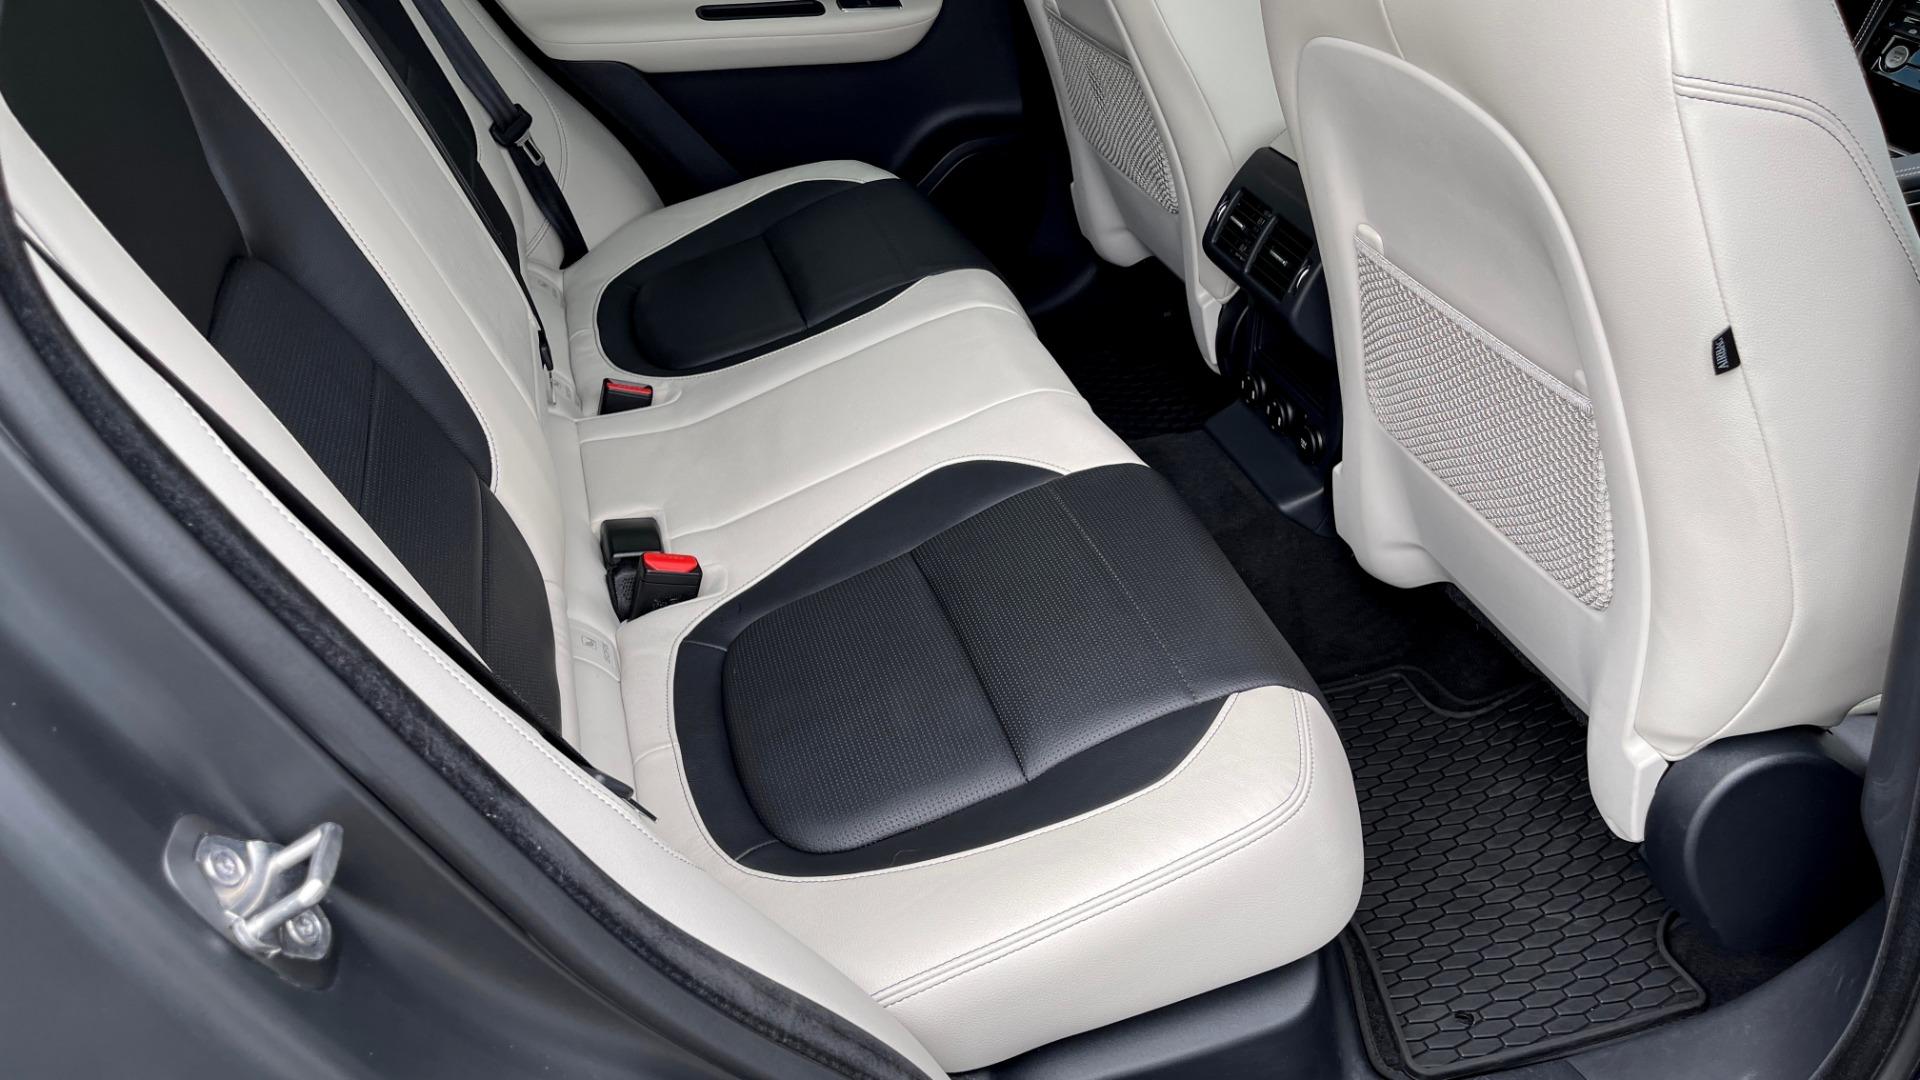 Used 2019 Jaguar F-PACE S / DRIVE PKG / BSA / HUD / BLACK EXT PKG / REARVIEW for sale $50,995 at Formula Imports in Charlotte NC 28227 59